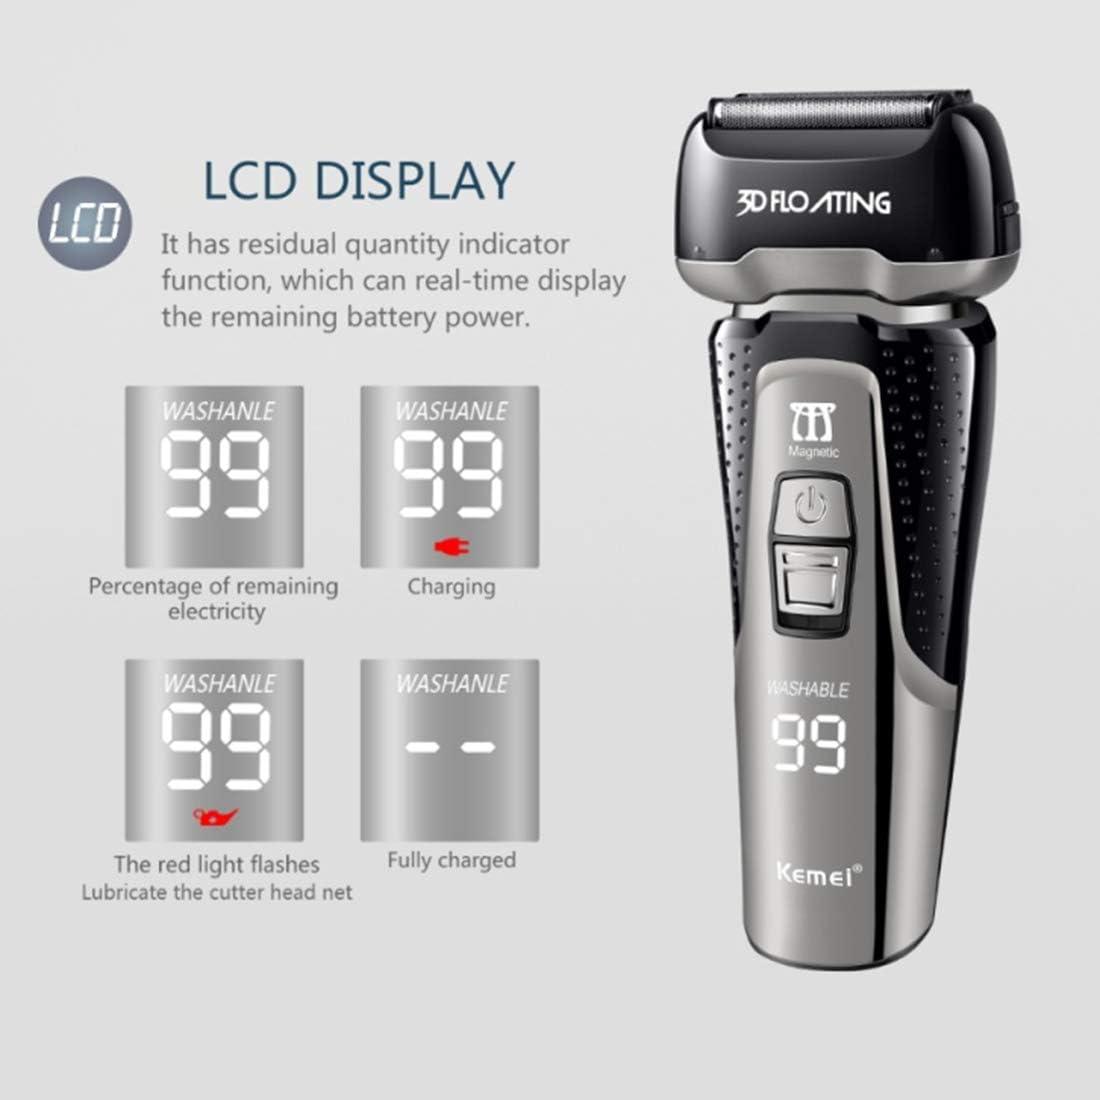 KLI Cabeza Flotante 3D Máquina de Afeitar de Afeitar eléctrica de Triple Hoja Pantalla LCD Recargable Máquina de Afeitar de la máquina de Afeitar de los Hombres Shaver Trimmer: Amazon.es: Hogar